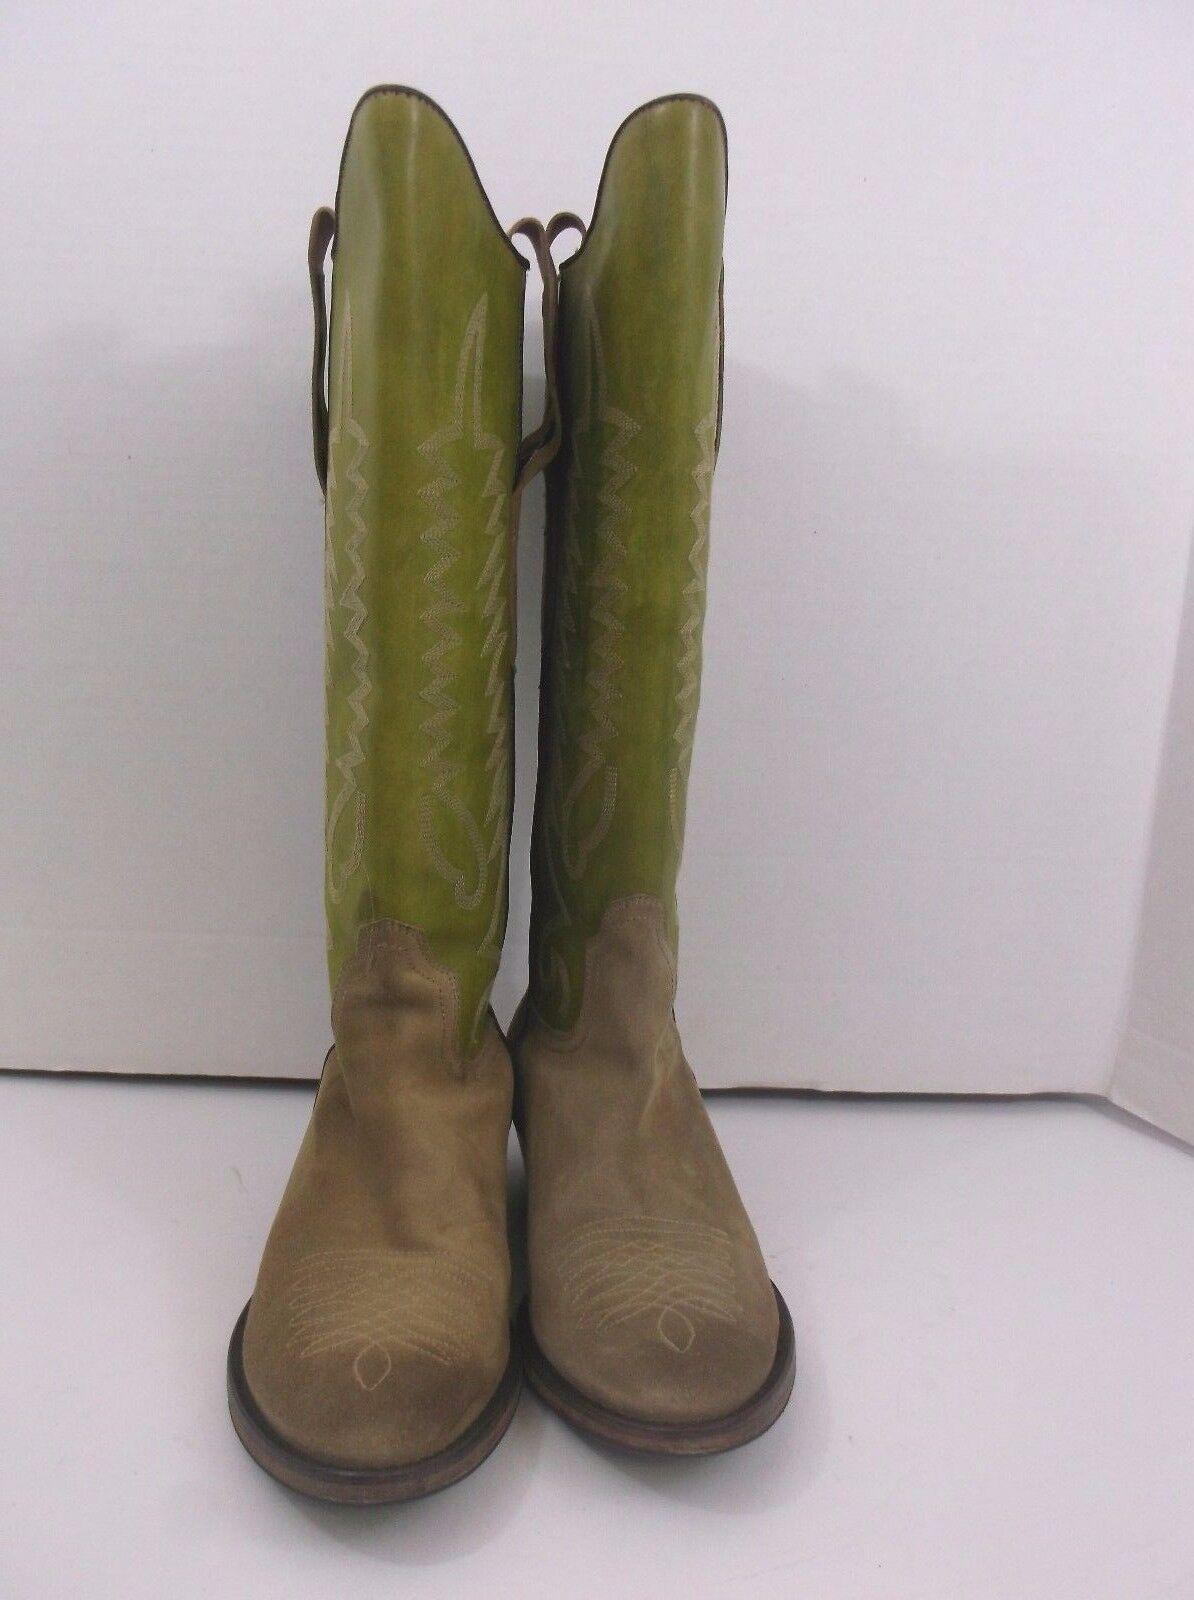 Numero 37 Italian Donna Pelle Western Donna Italian Stivali Green Tan size 39 Euro 7.5 us 15c8c2